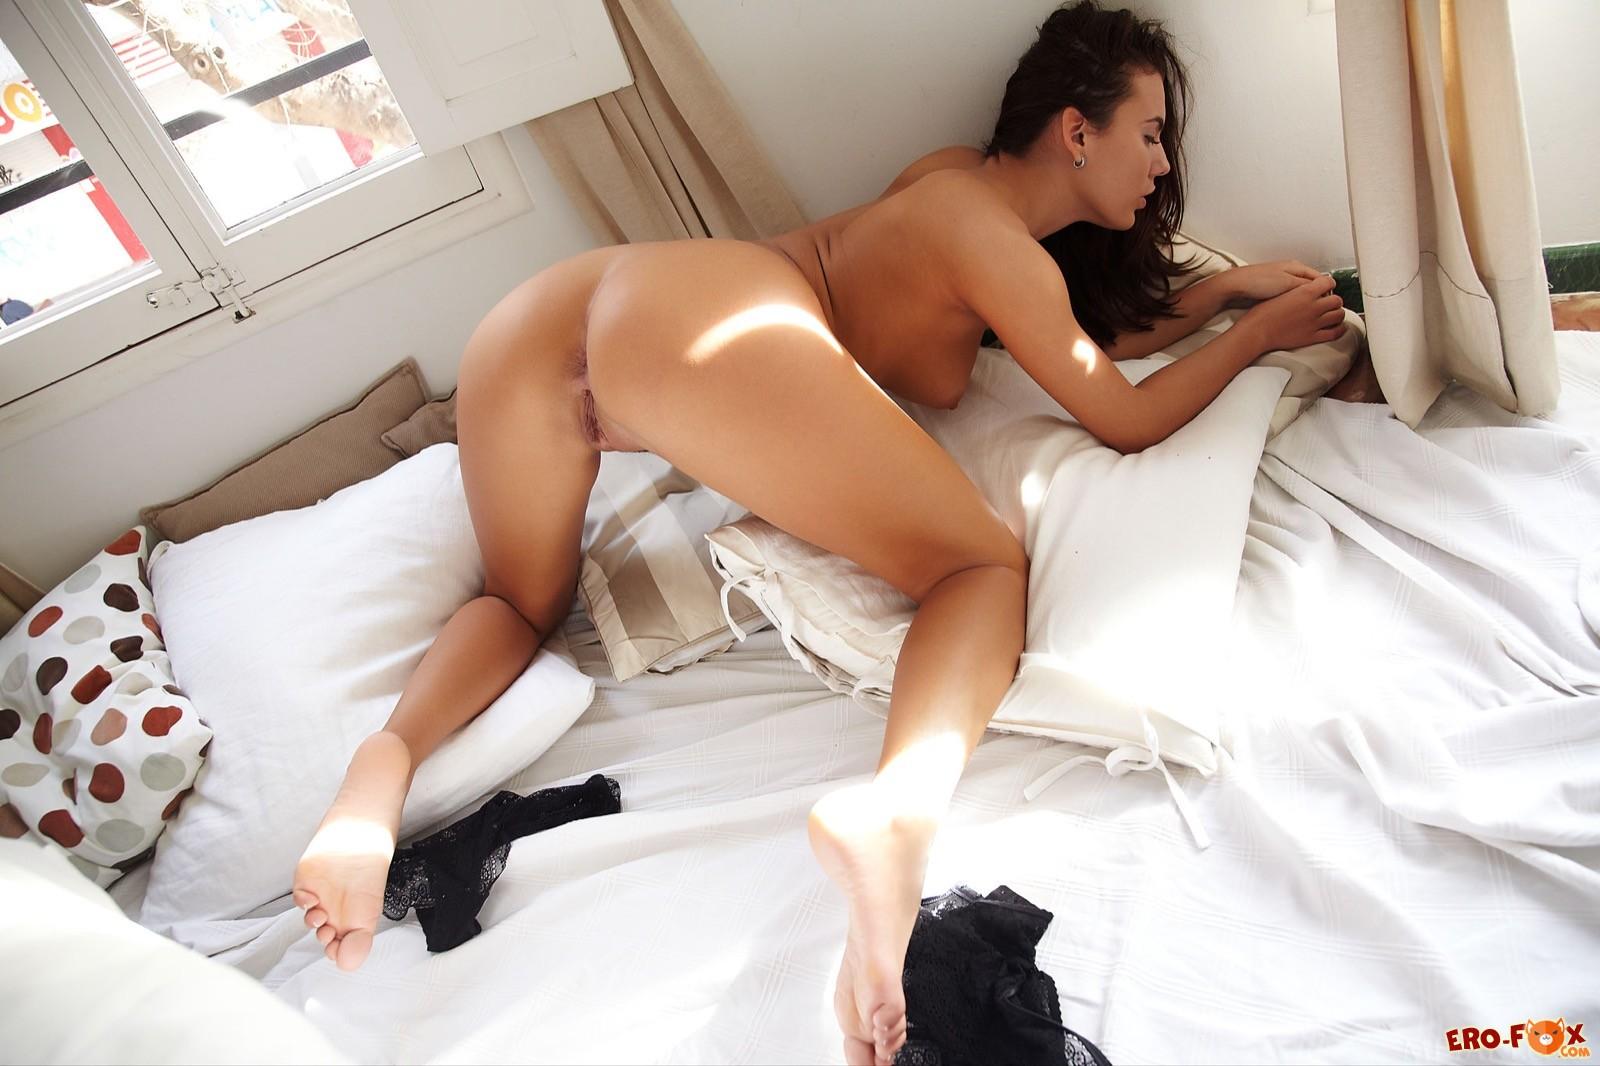 Загорелая красавица раздвигает ноги лежа на кровати